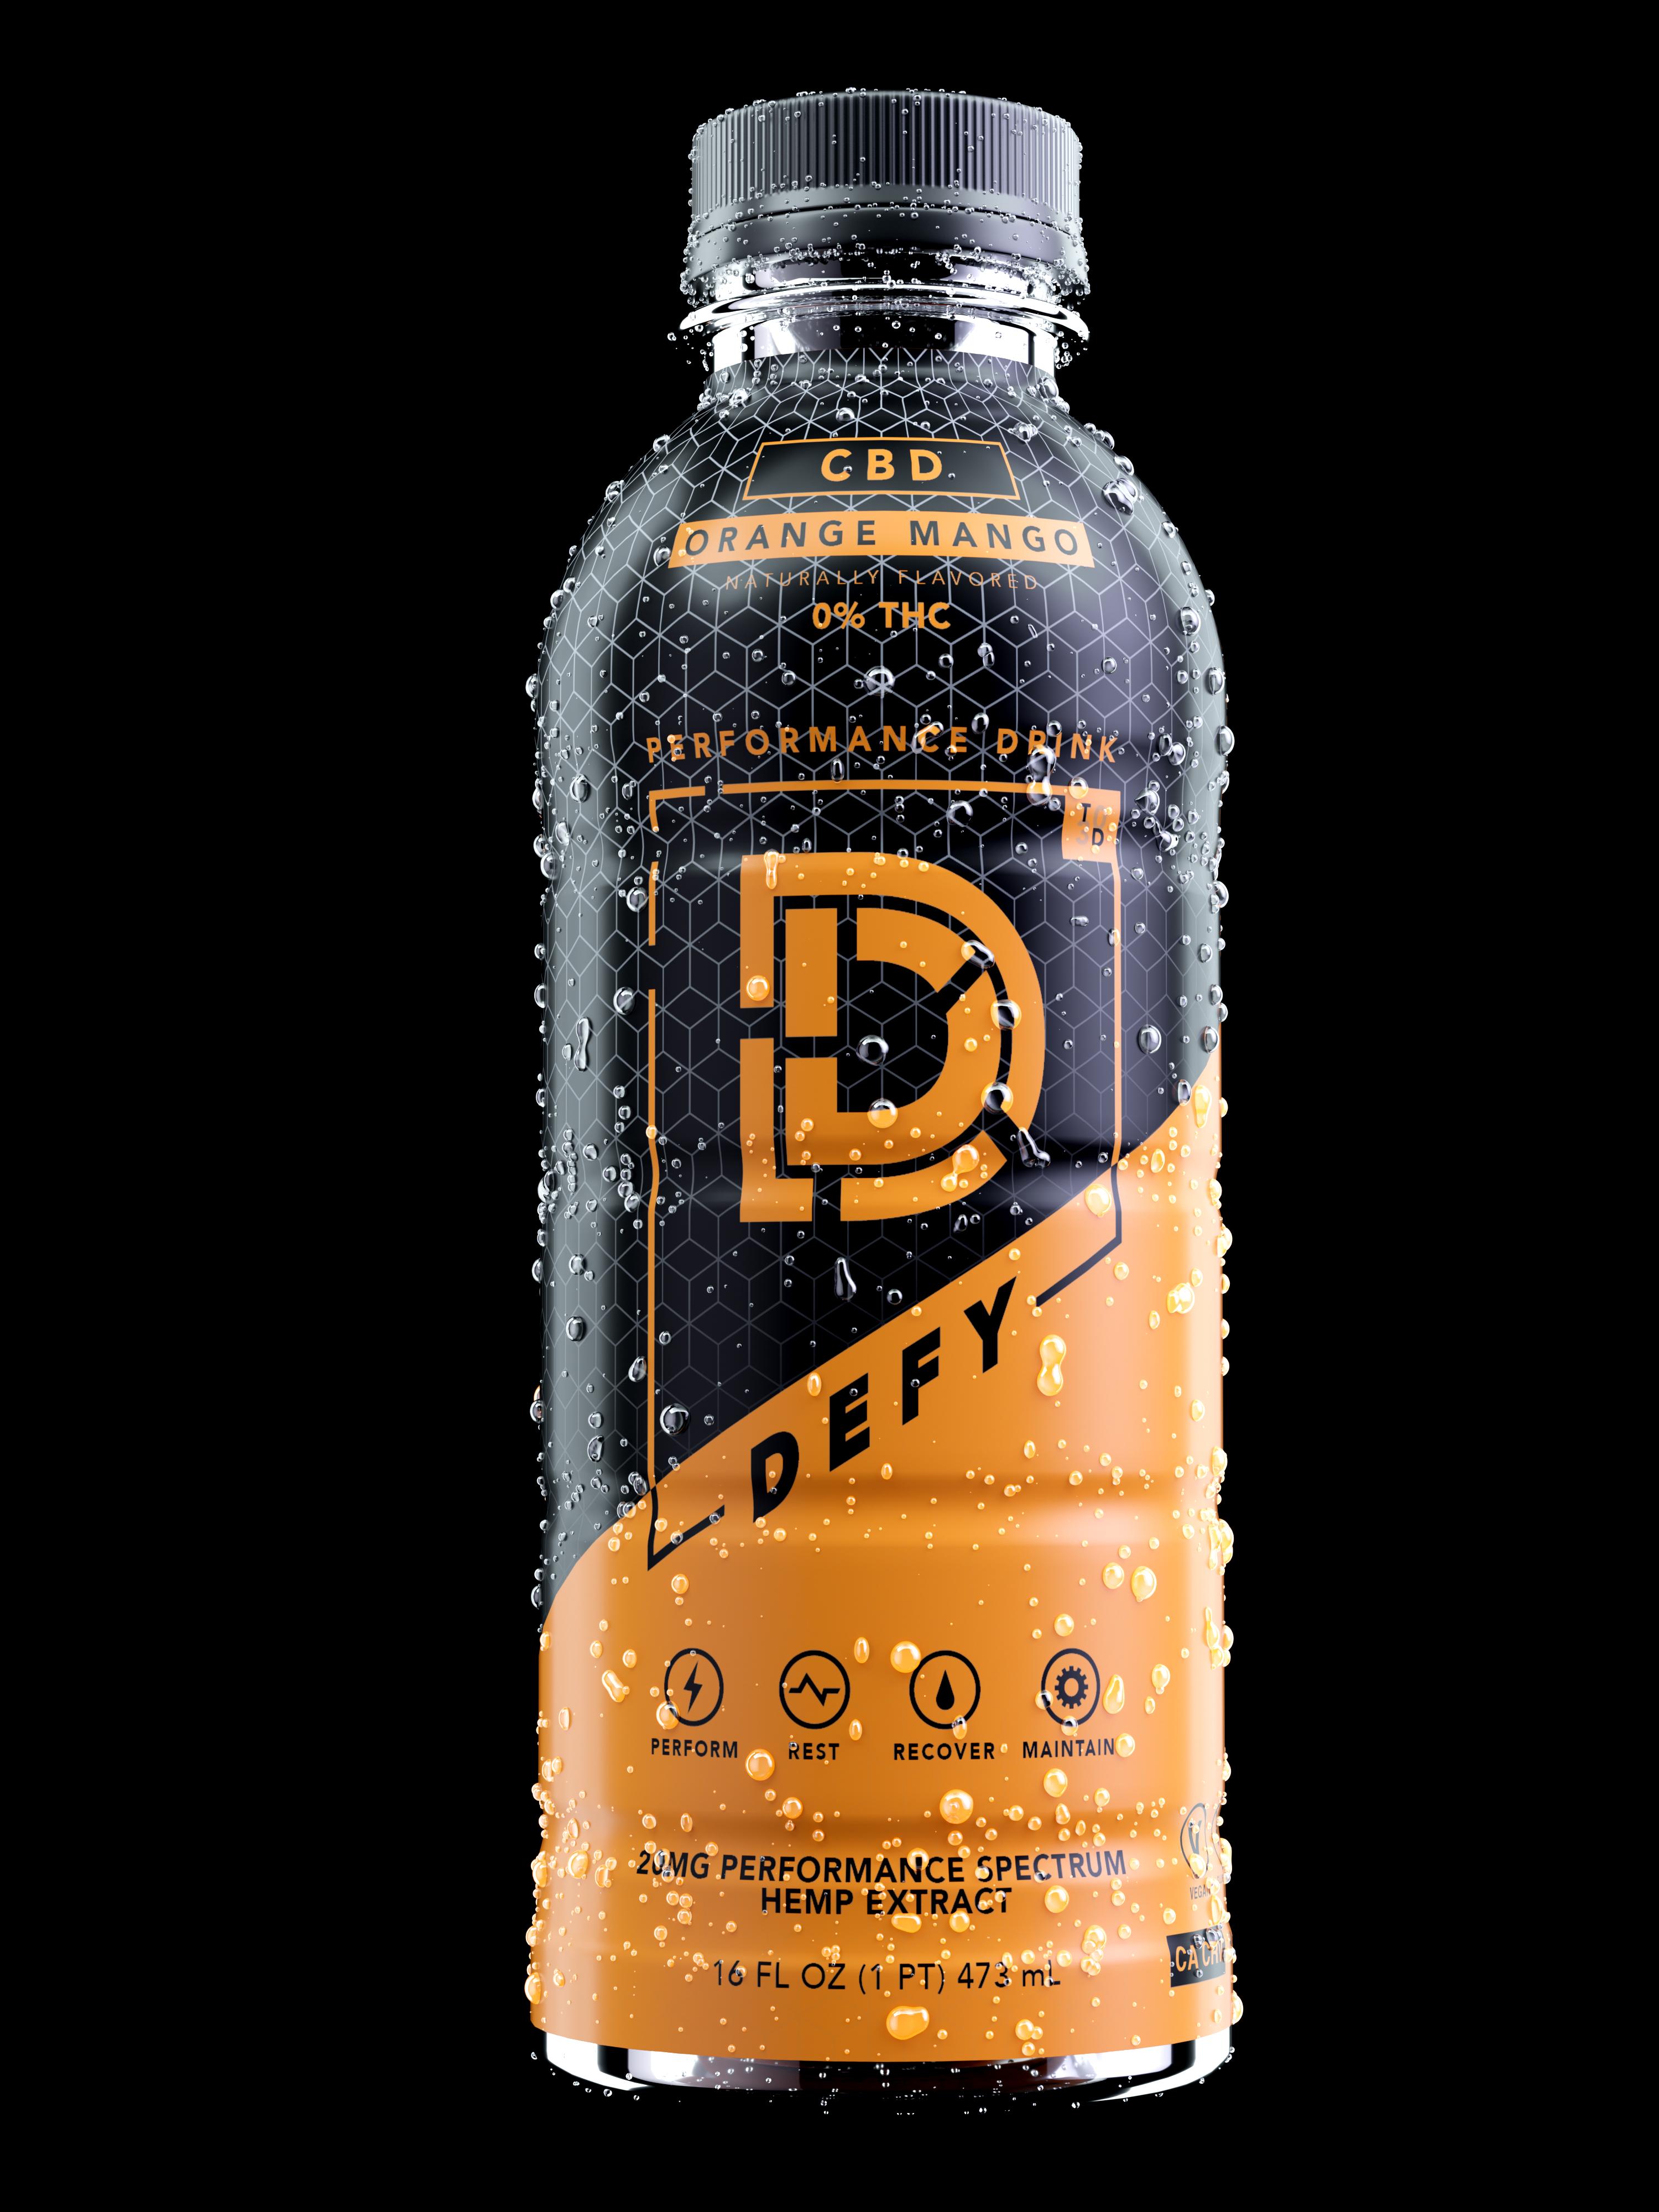 Orange Mango - Performance Drink CBD 20mg